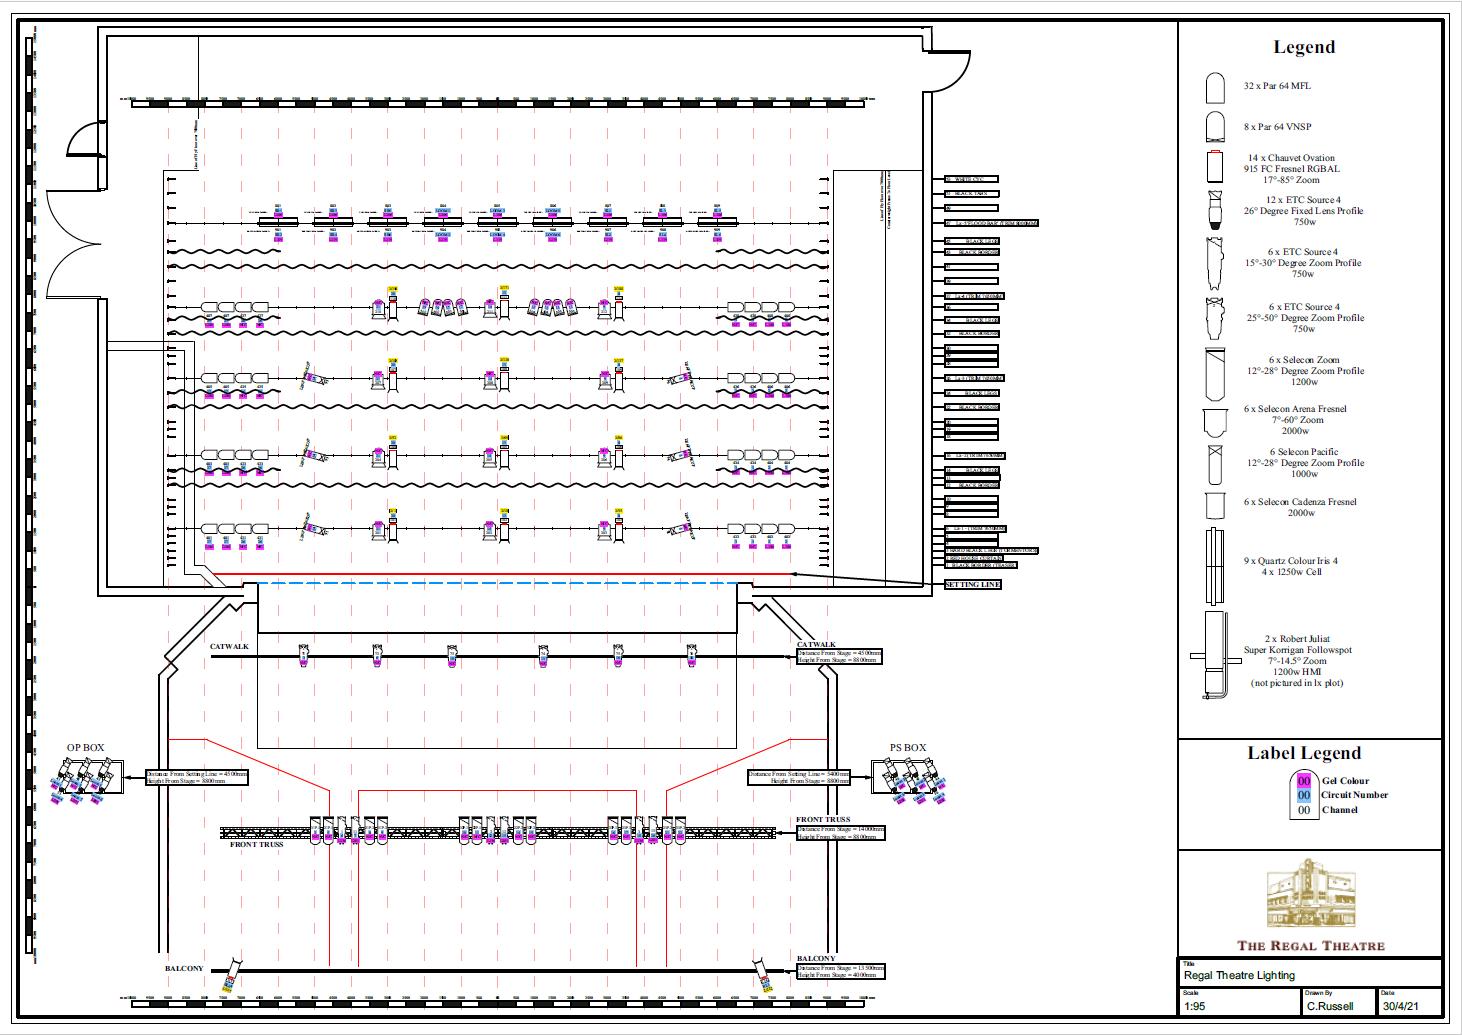 Arts Theatre Seating Plan Adelaide